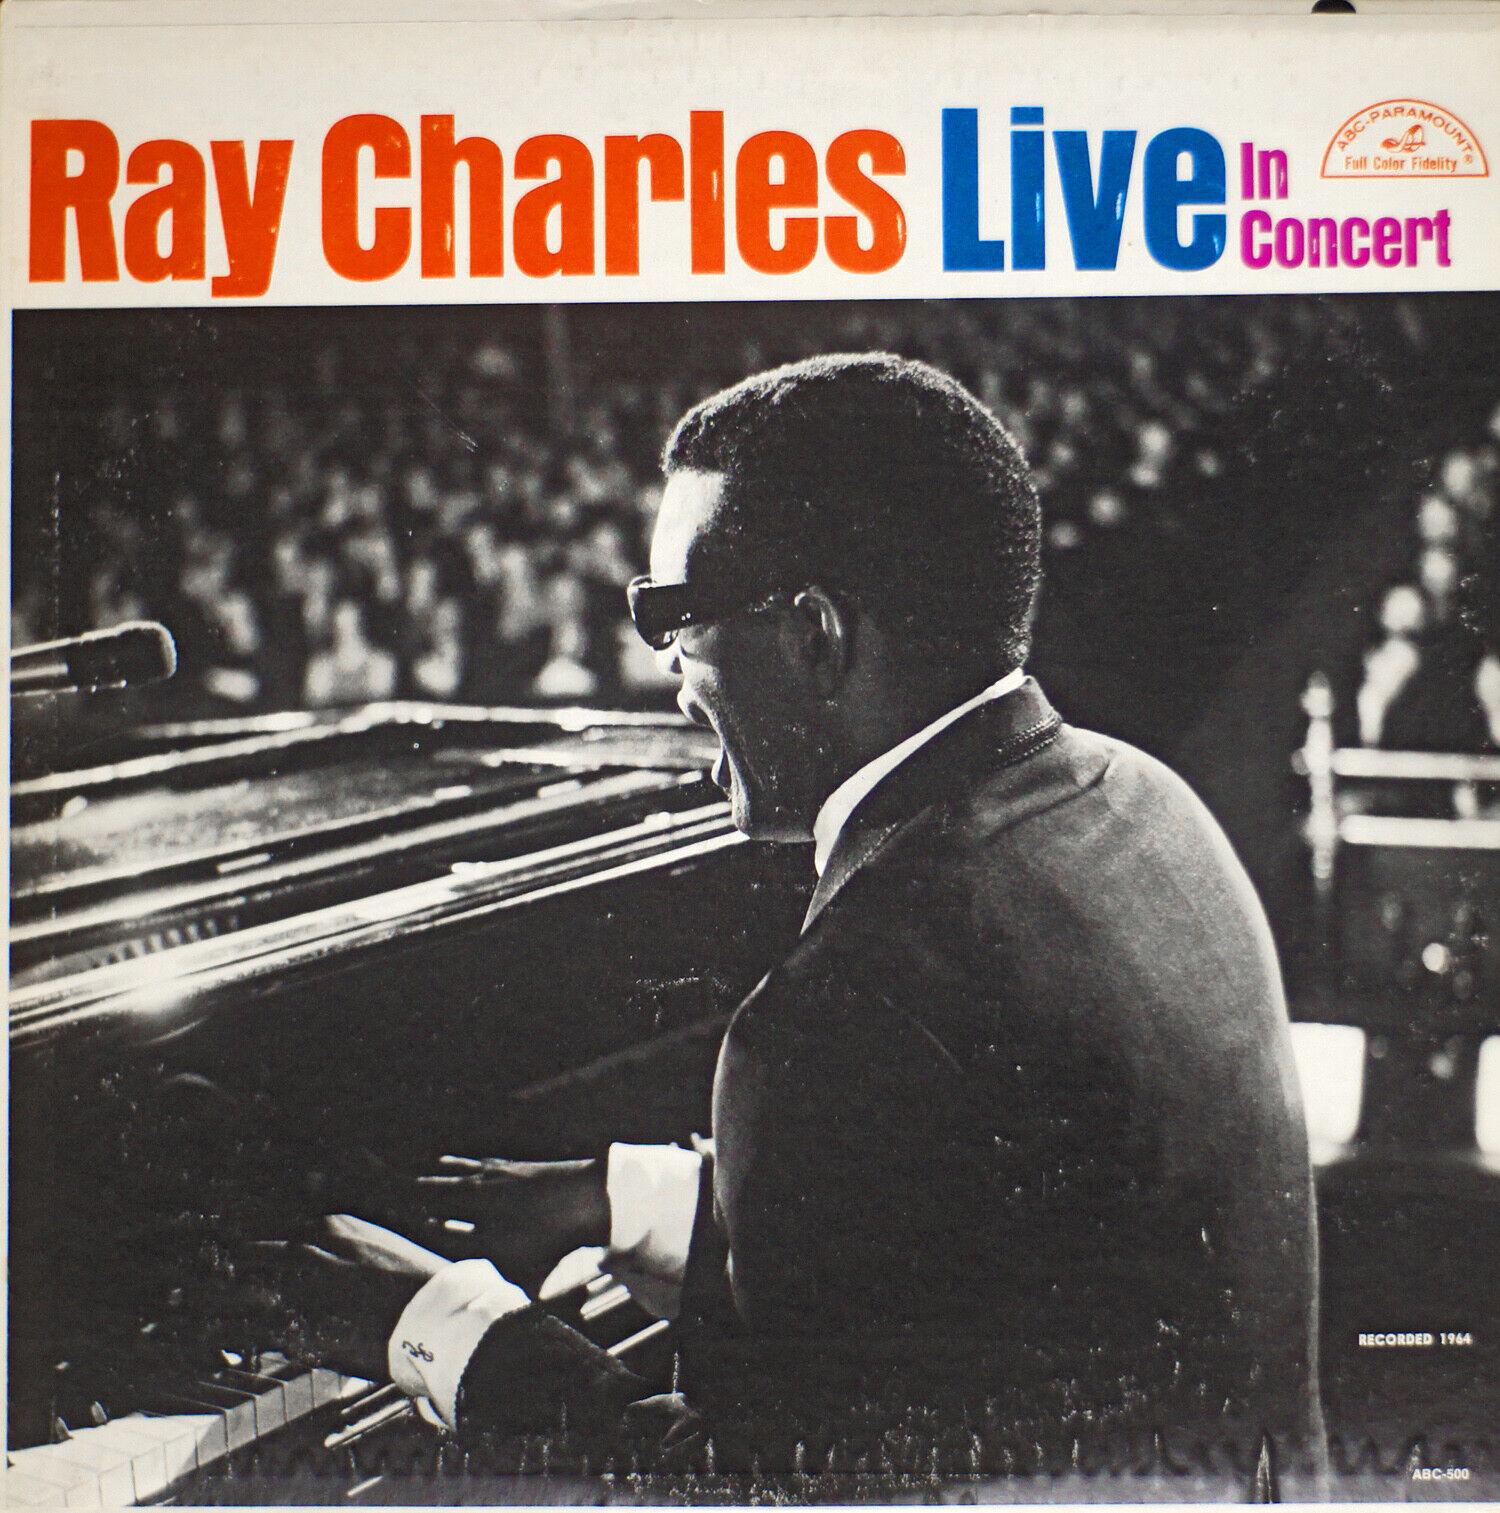 Ray Charles - Live In Concert EX/VG 07-1588 LP Vinyl - $15.00